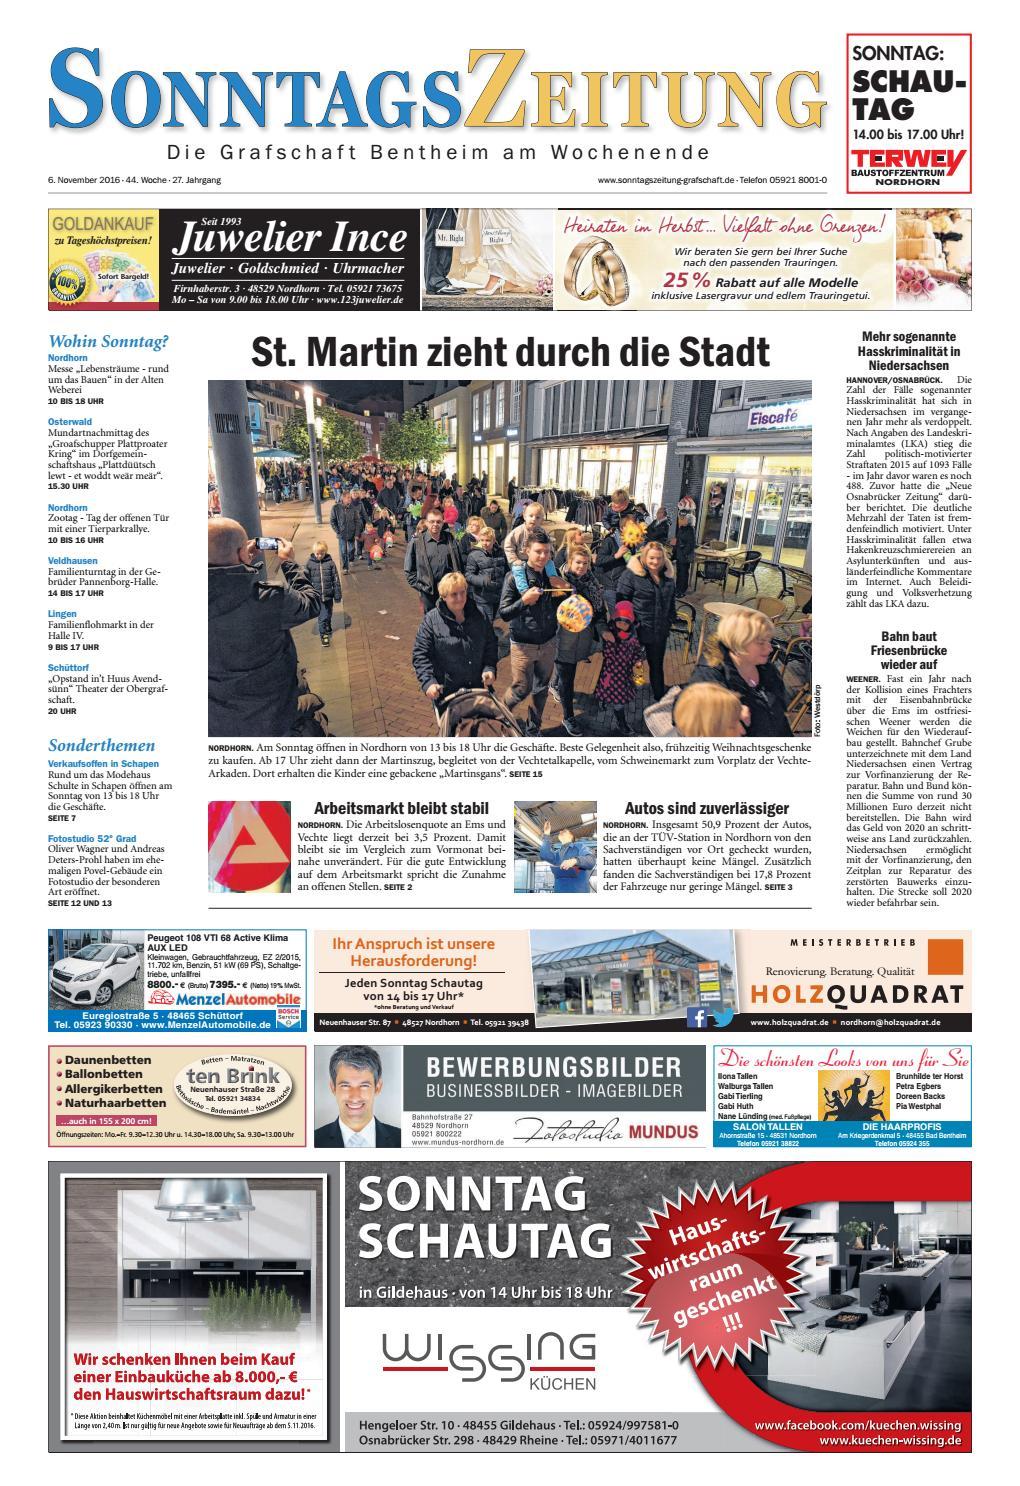 SonntagsZeitung_06-11-2016 by SonntagsZeitung - issuu